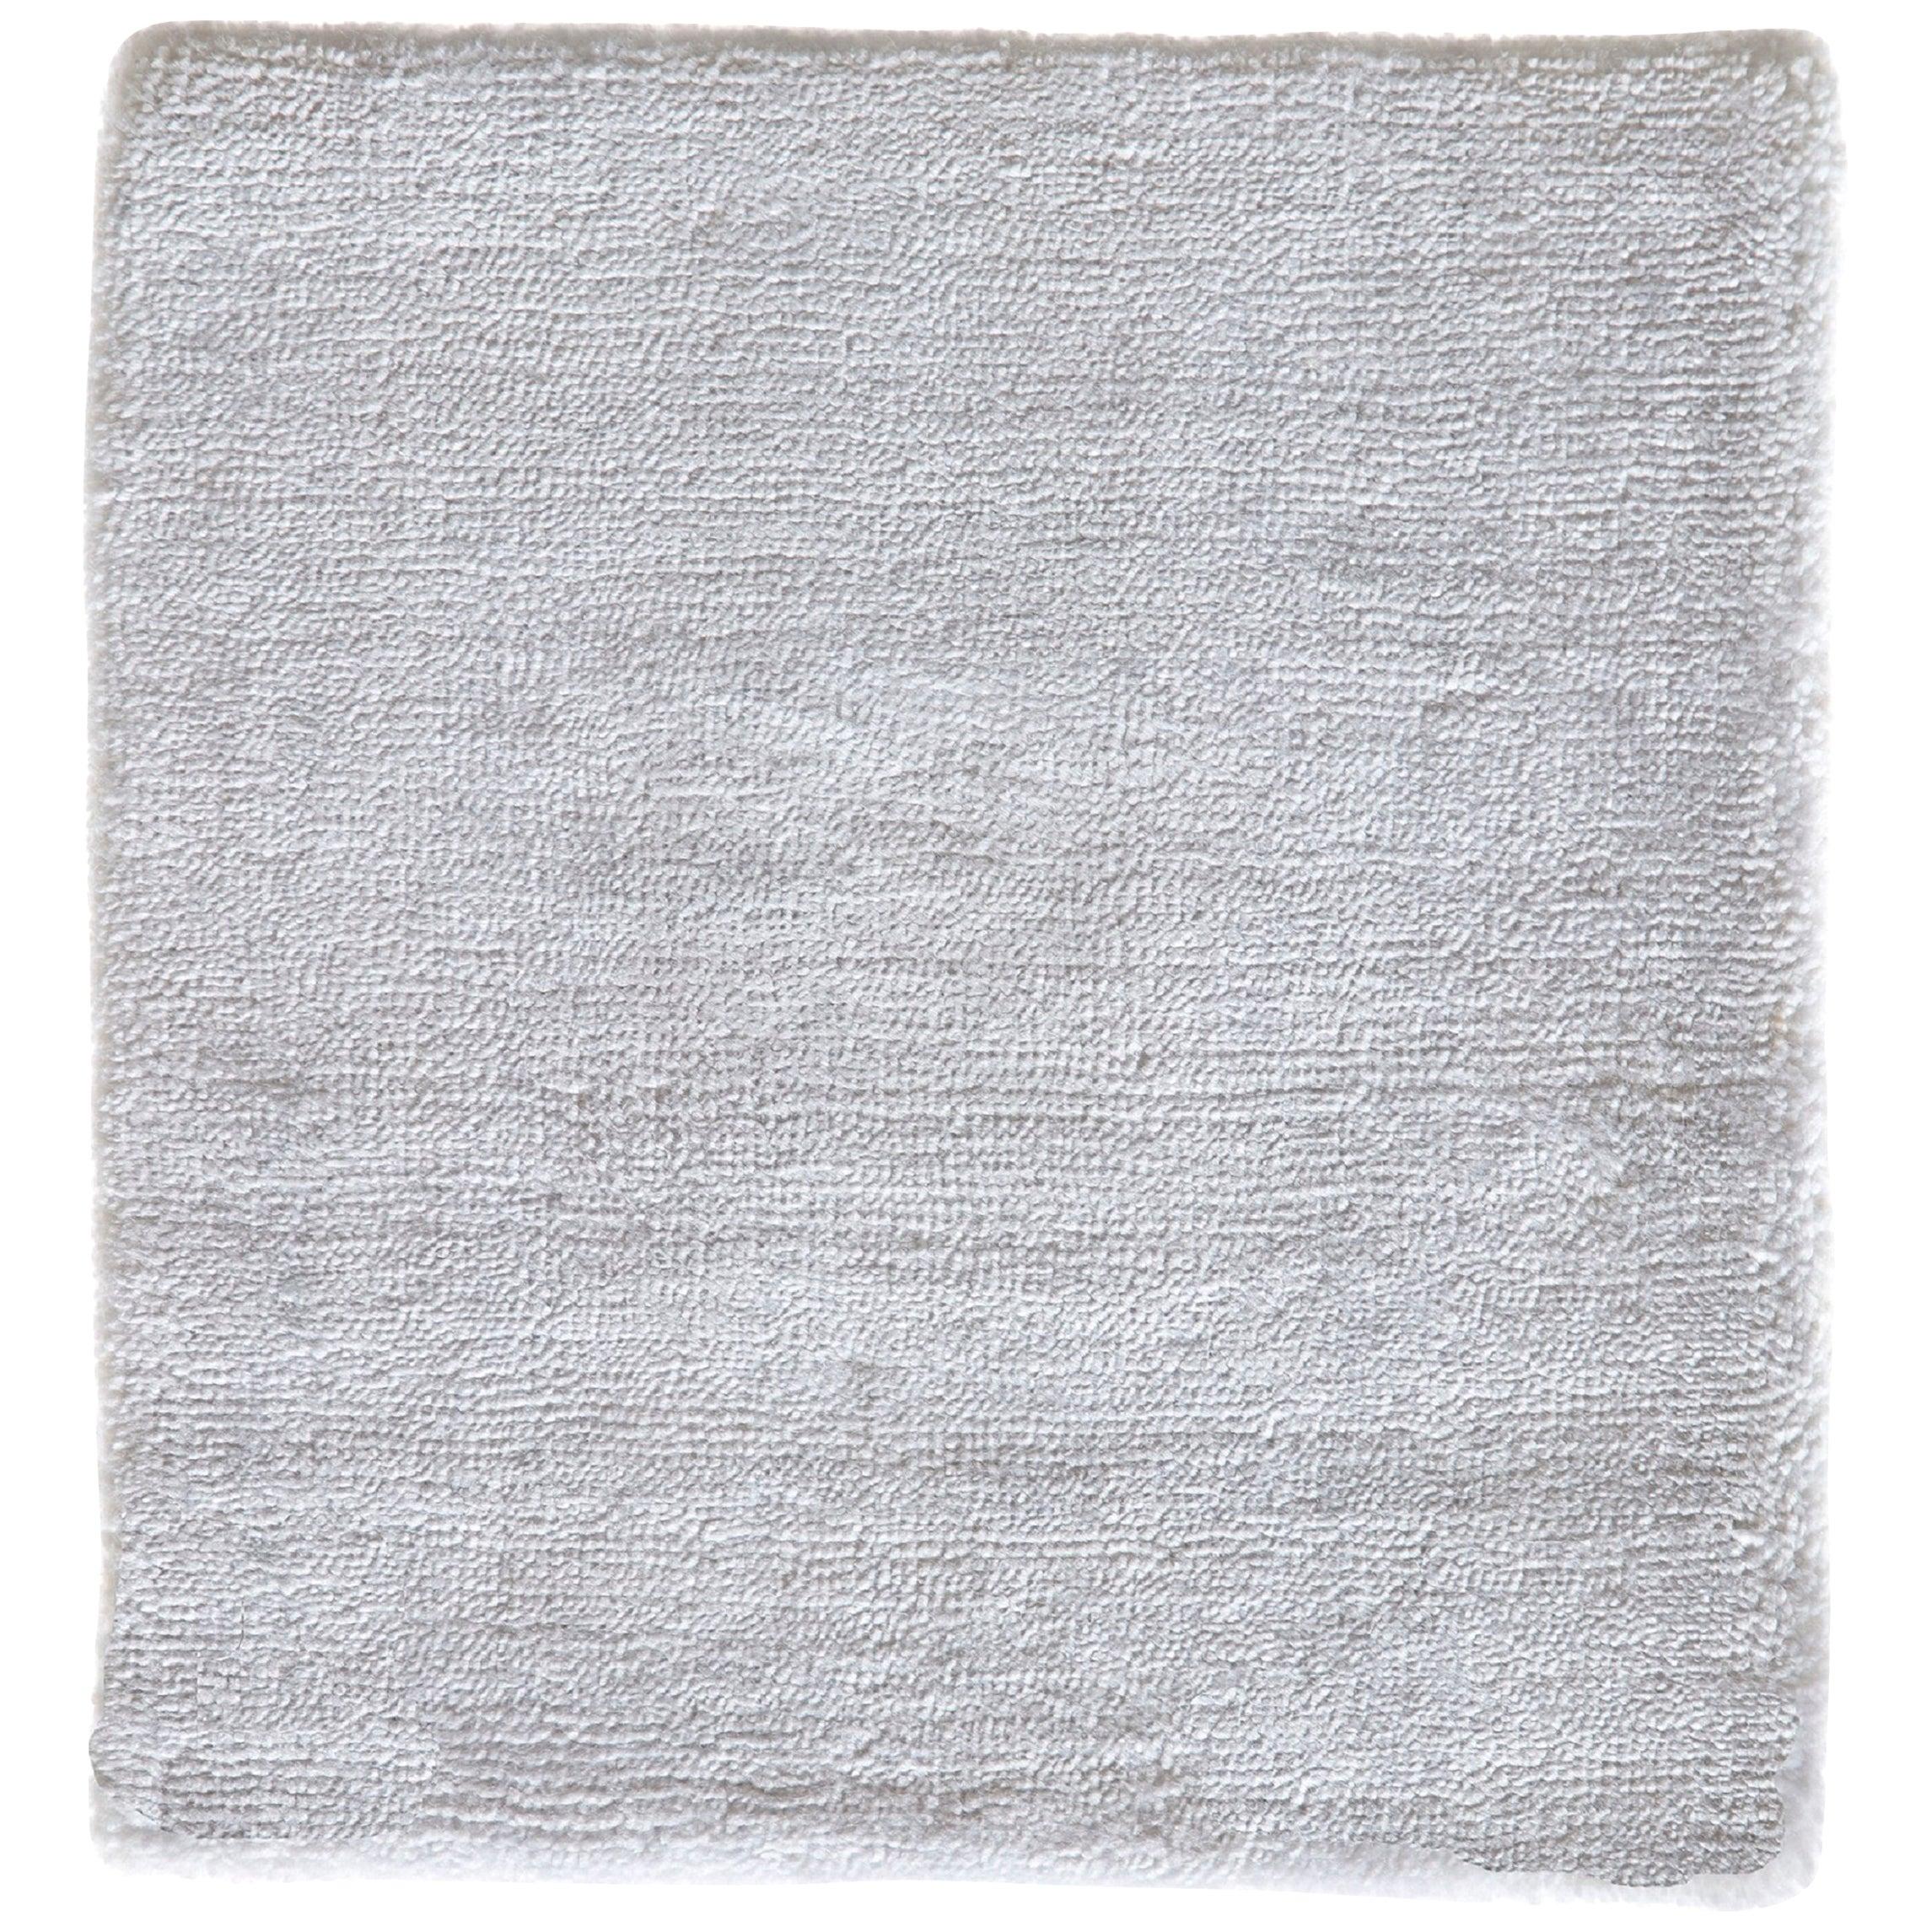 Modern Sold White Neutral Hand Loom Rug